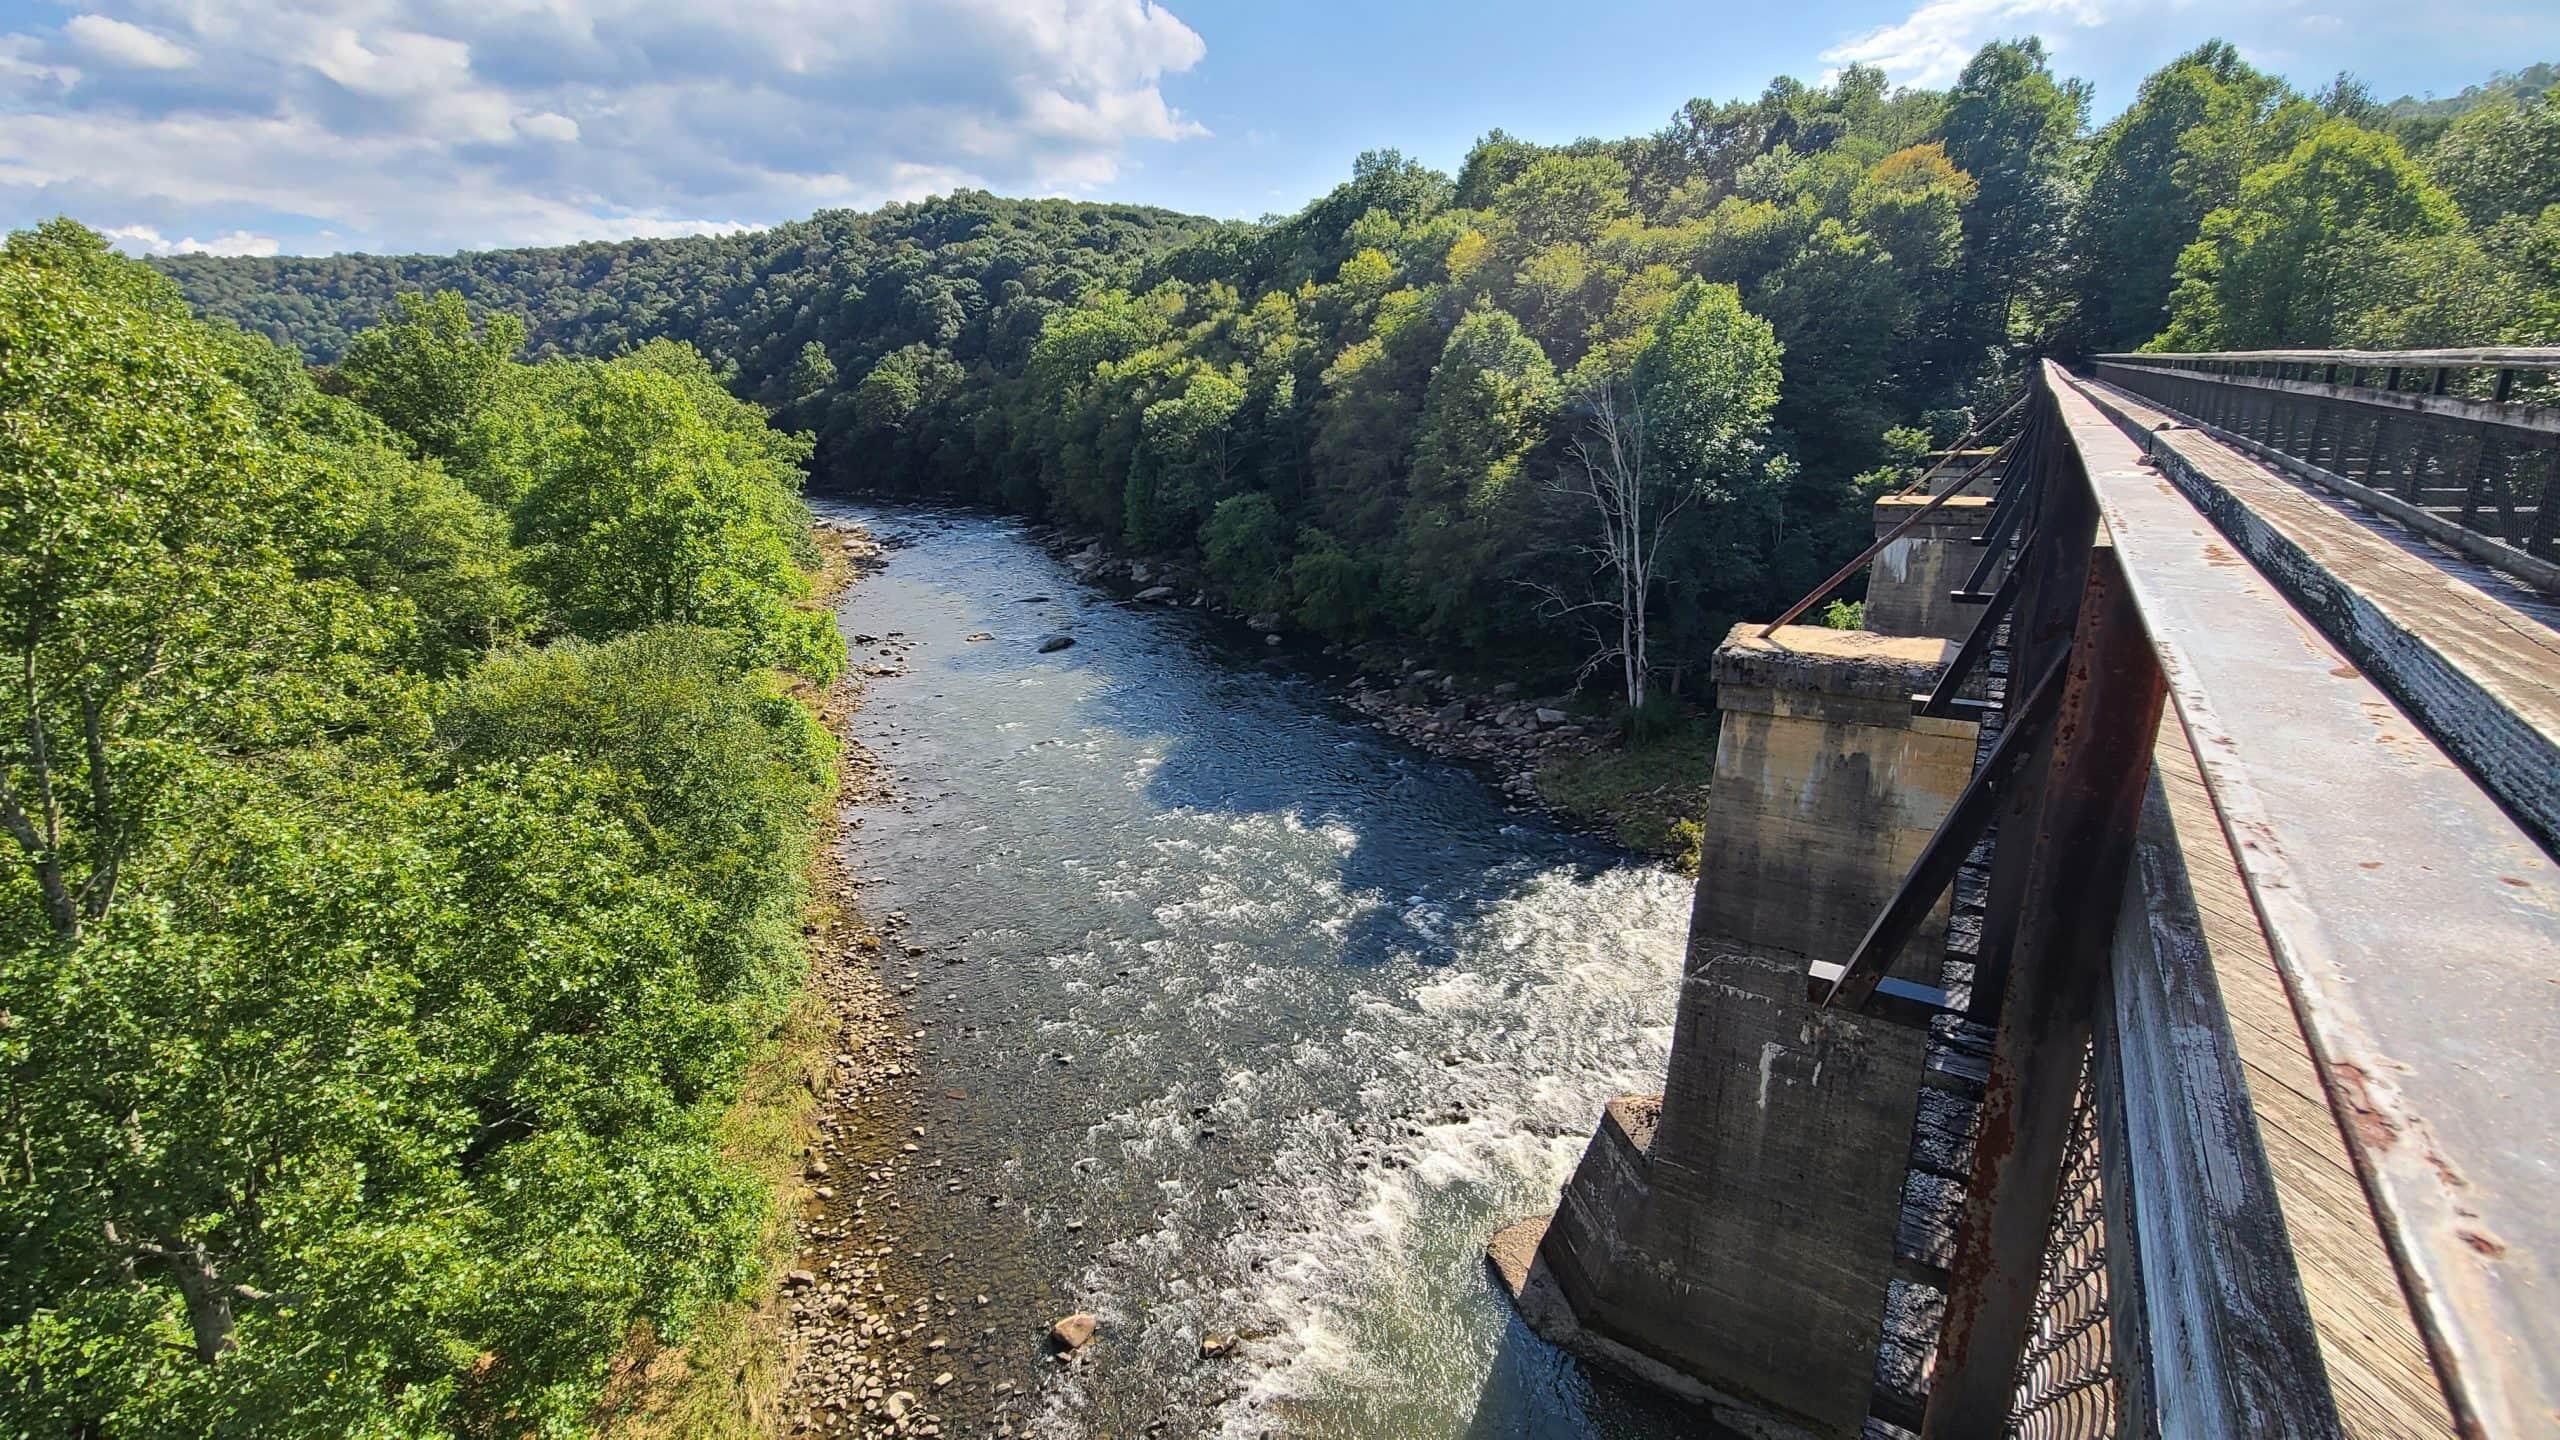 The Pinkerton high bridge sits on concrete piers high above the Casselman River.